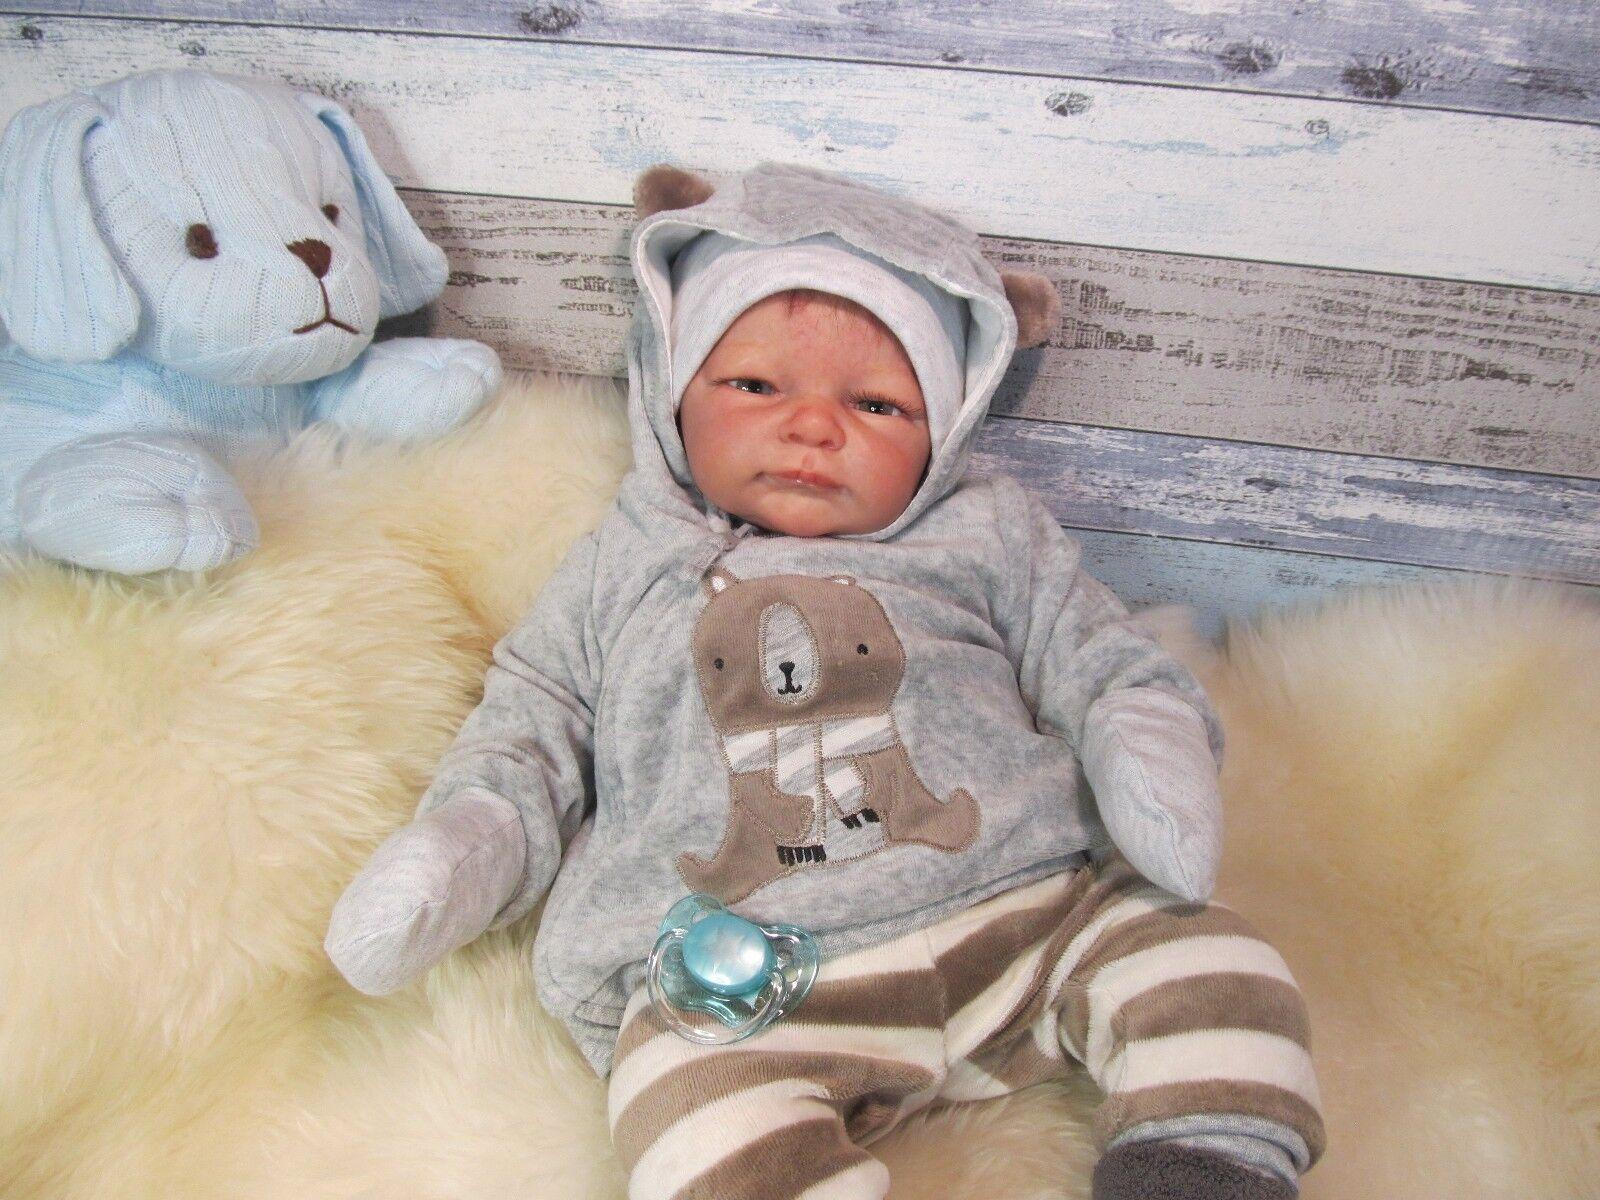 Ninisingen Reborn Baby Marlus Knuddelbaby Cuddle Baby Babypuppe Rebornbaby Puppe